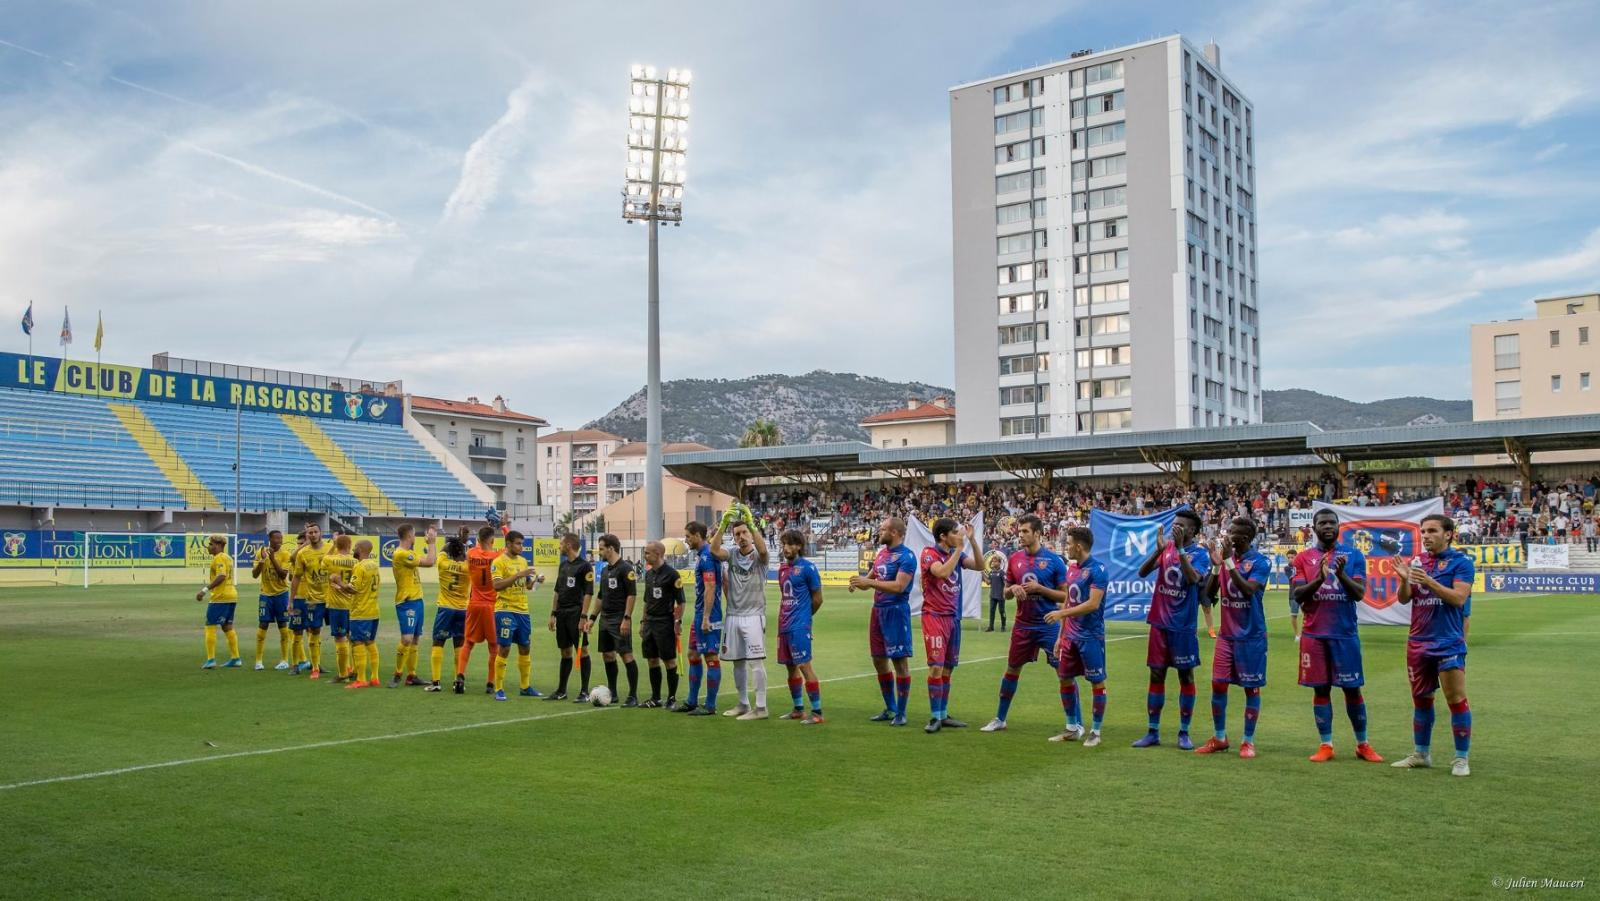 📸Revivez en images la rencontre face auGFCA - Gazélec Football Club Aiacciu(1-1) !